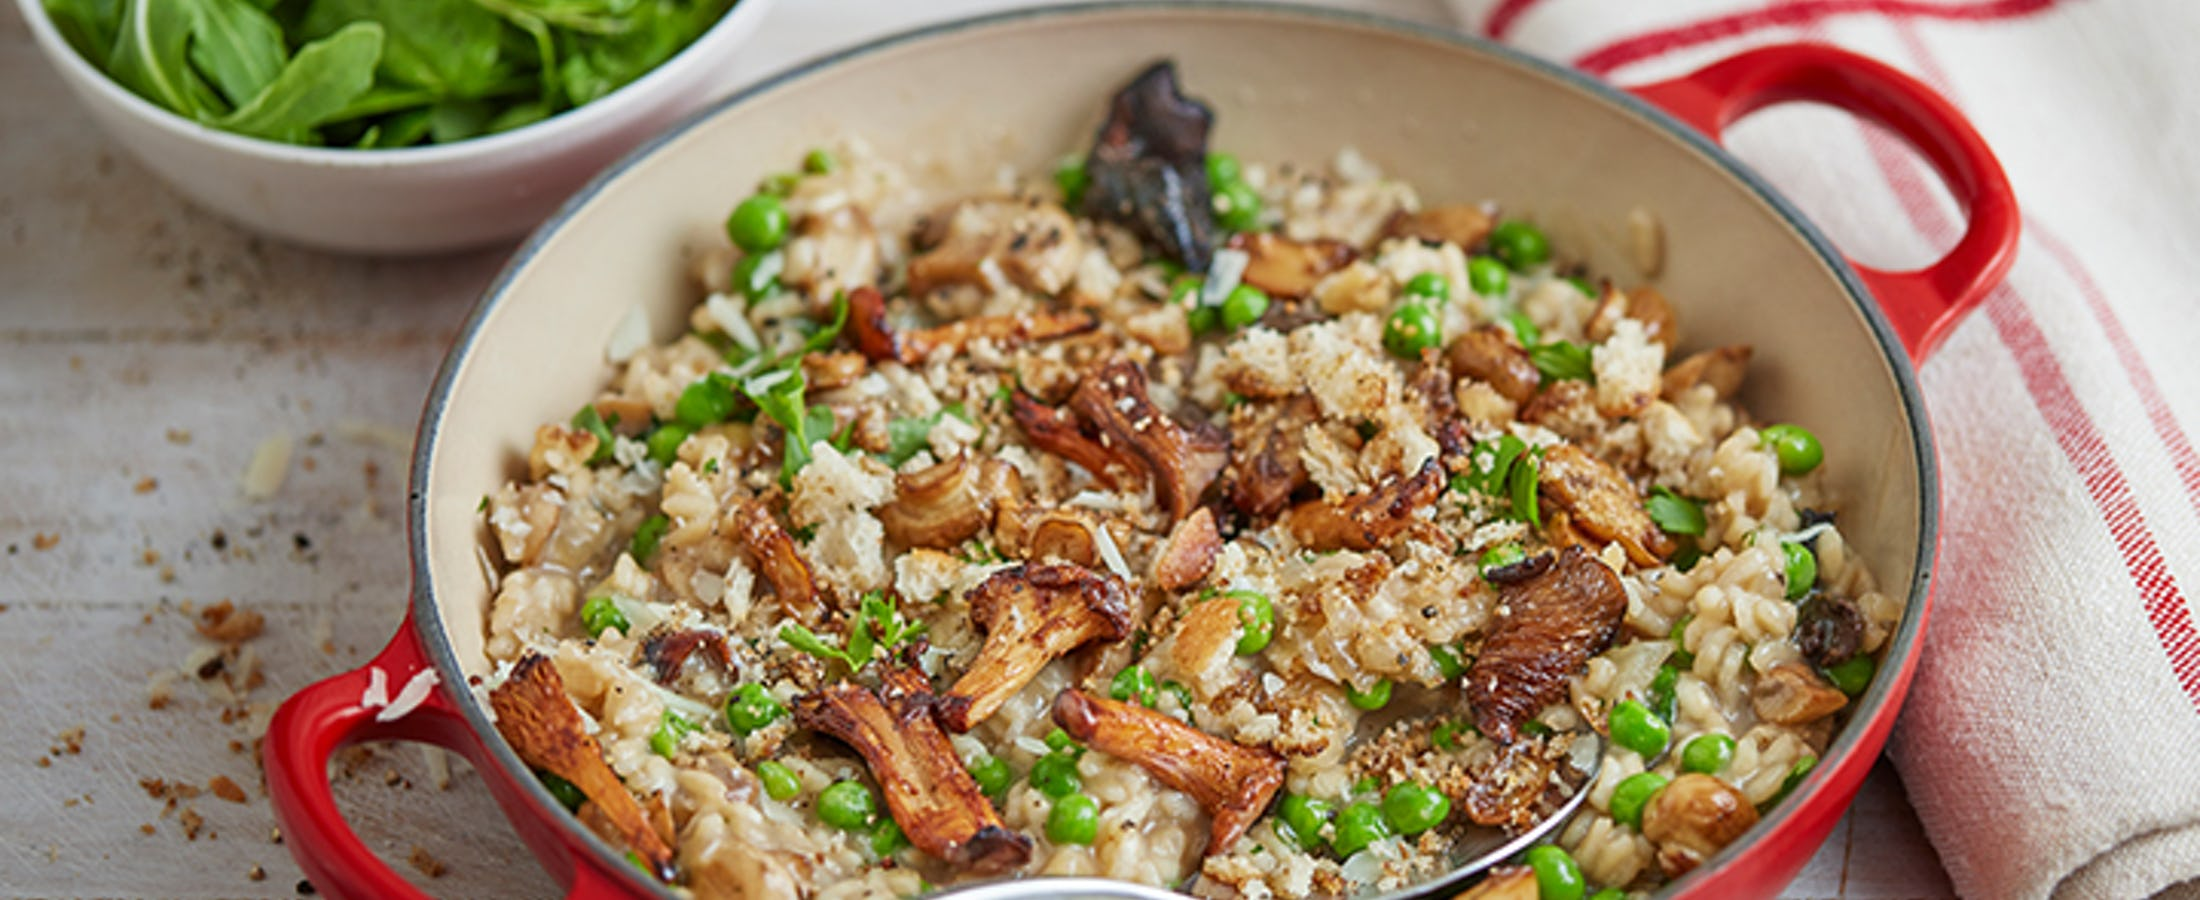 Mushroom & Pea Risotto